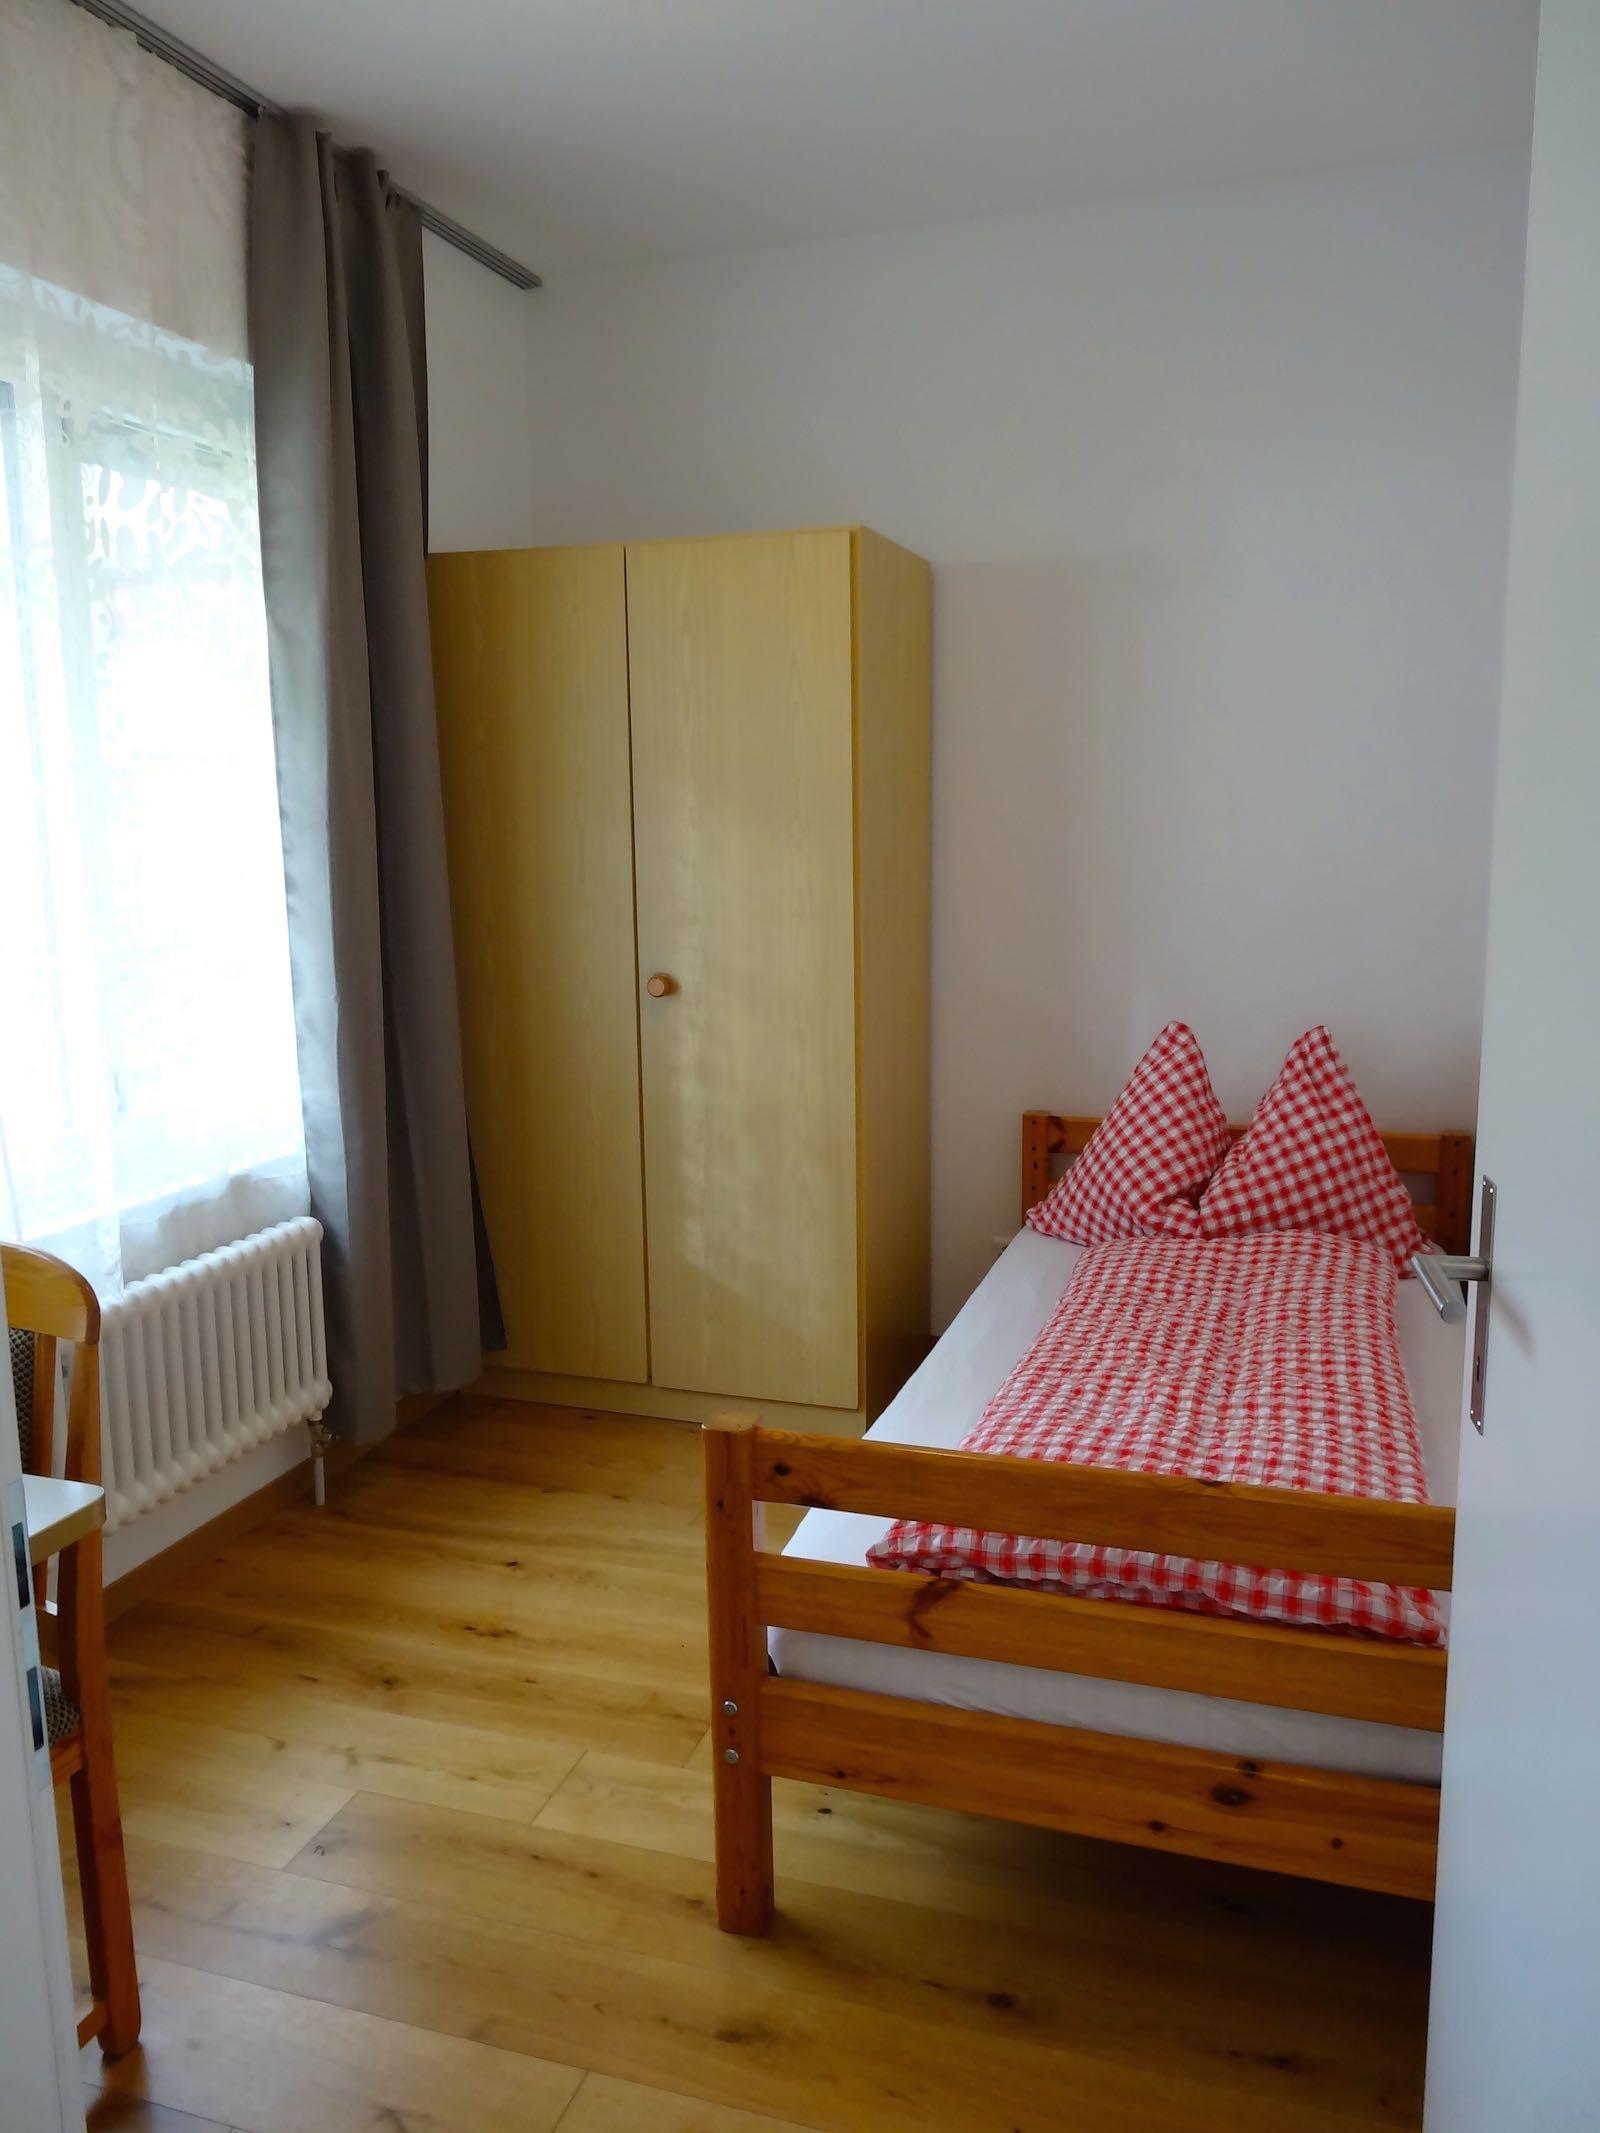 http://hoteljungfrau.ch/wp-content/uploads/2014/11/mosca-11.jpg